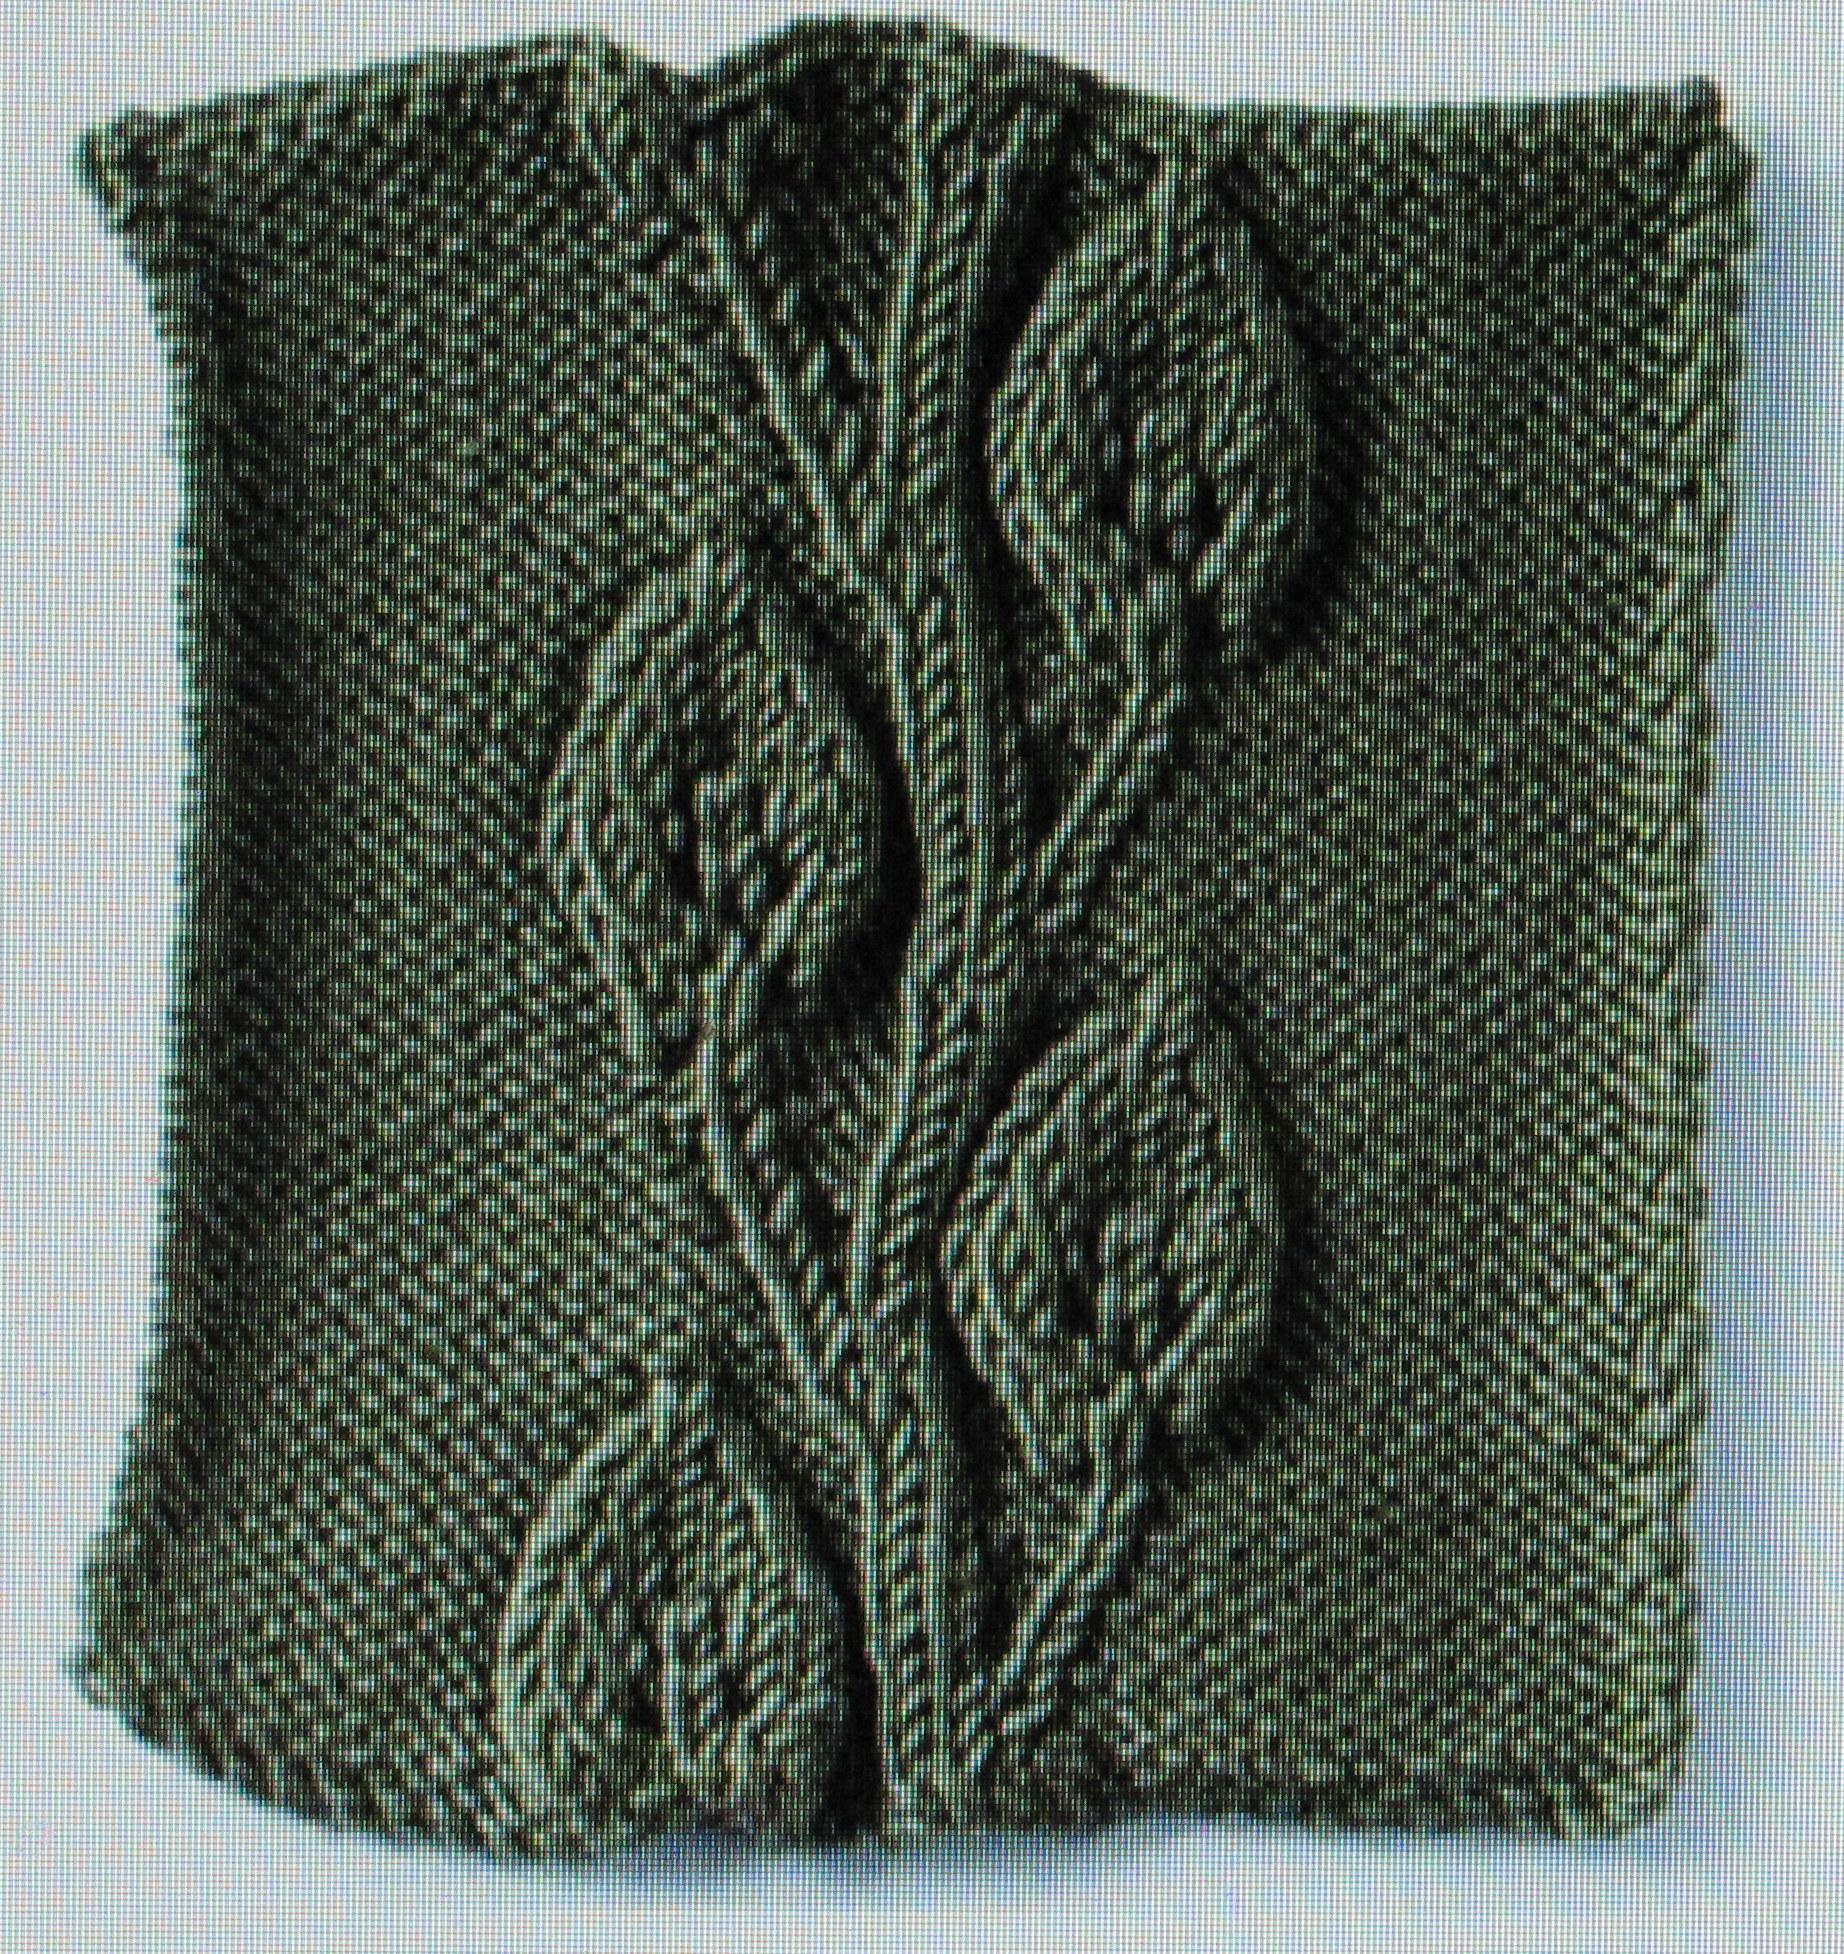 Ivy Leaf Knitting Pattern : 2012 A-Z Challenge Page 8